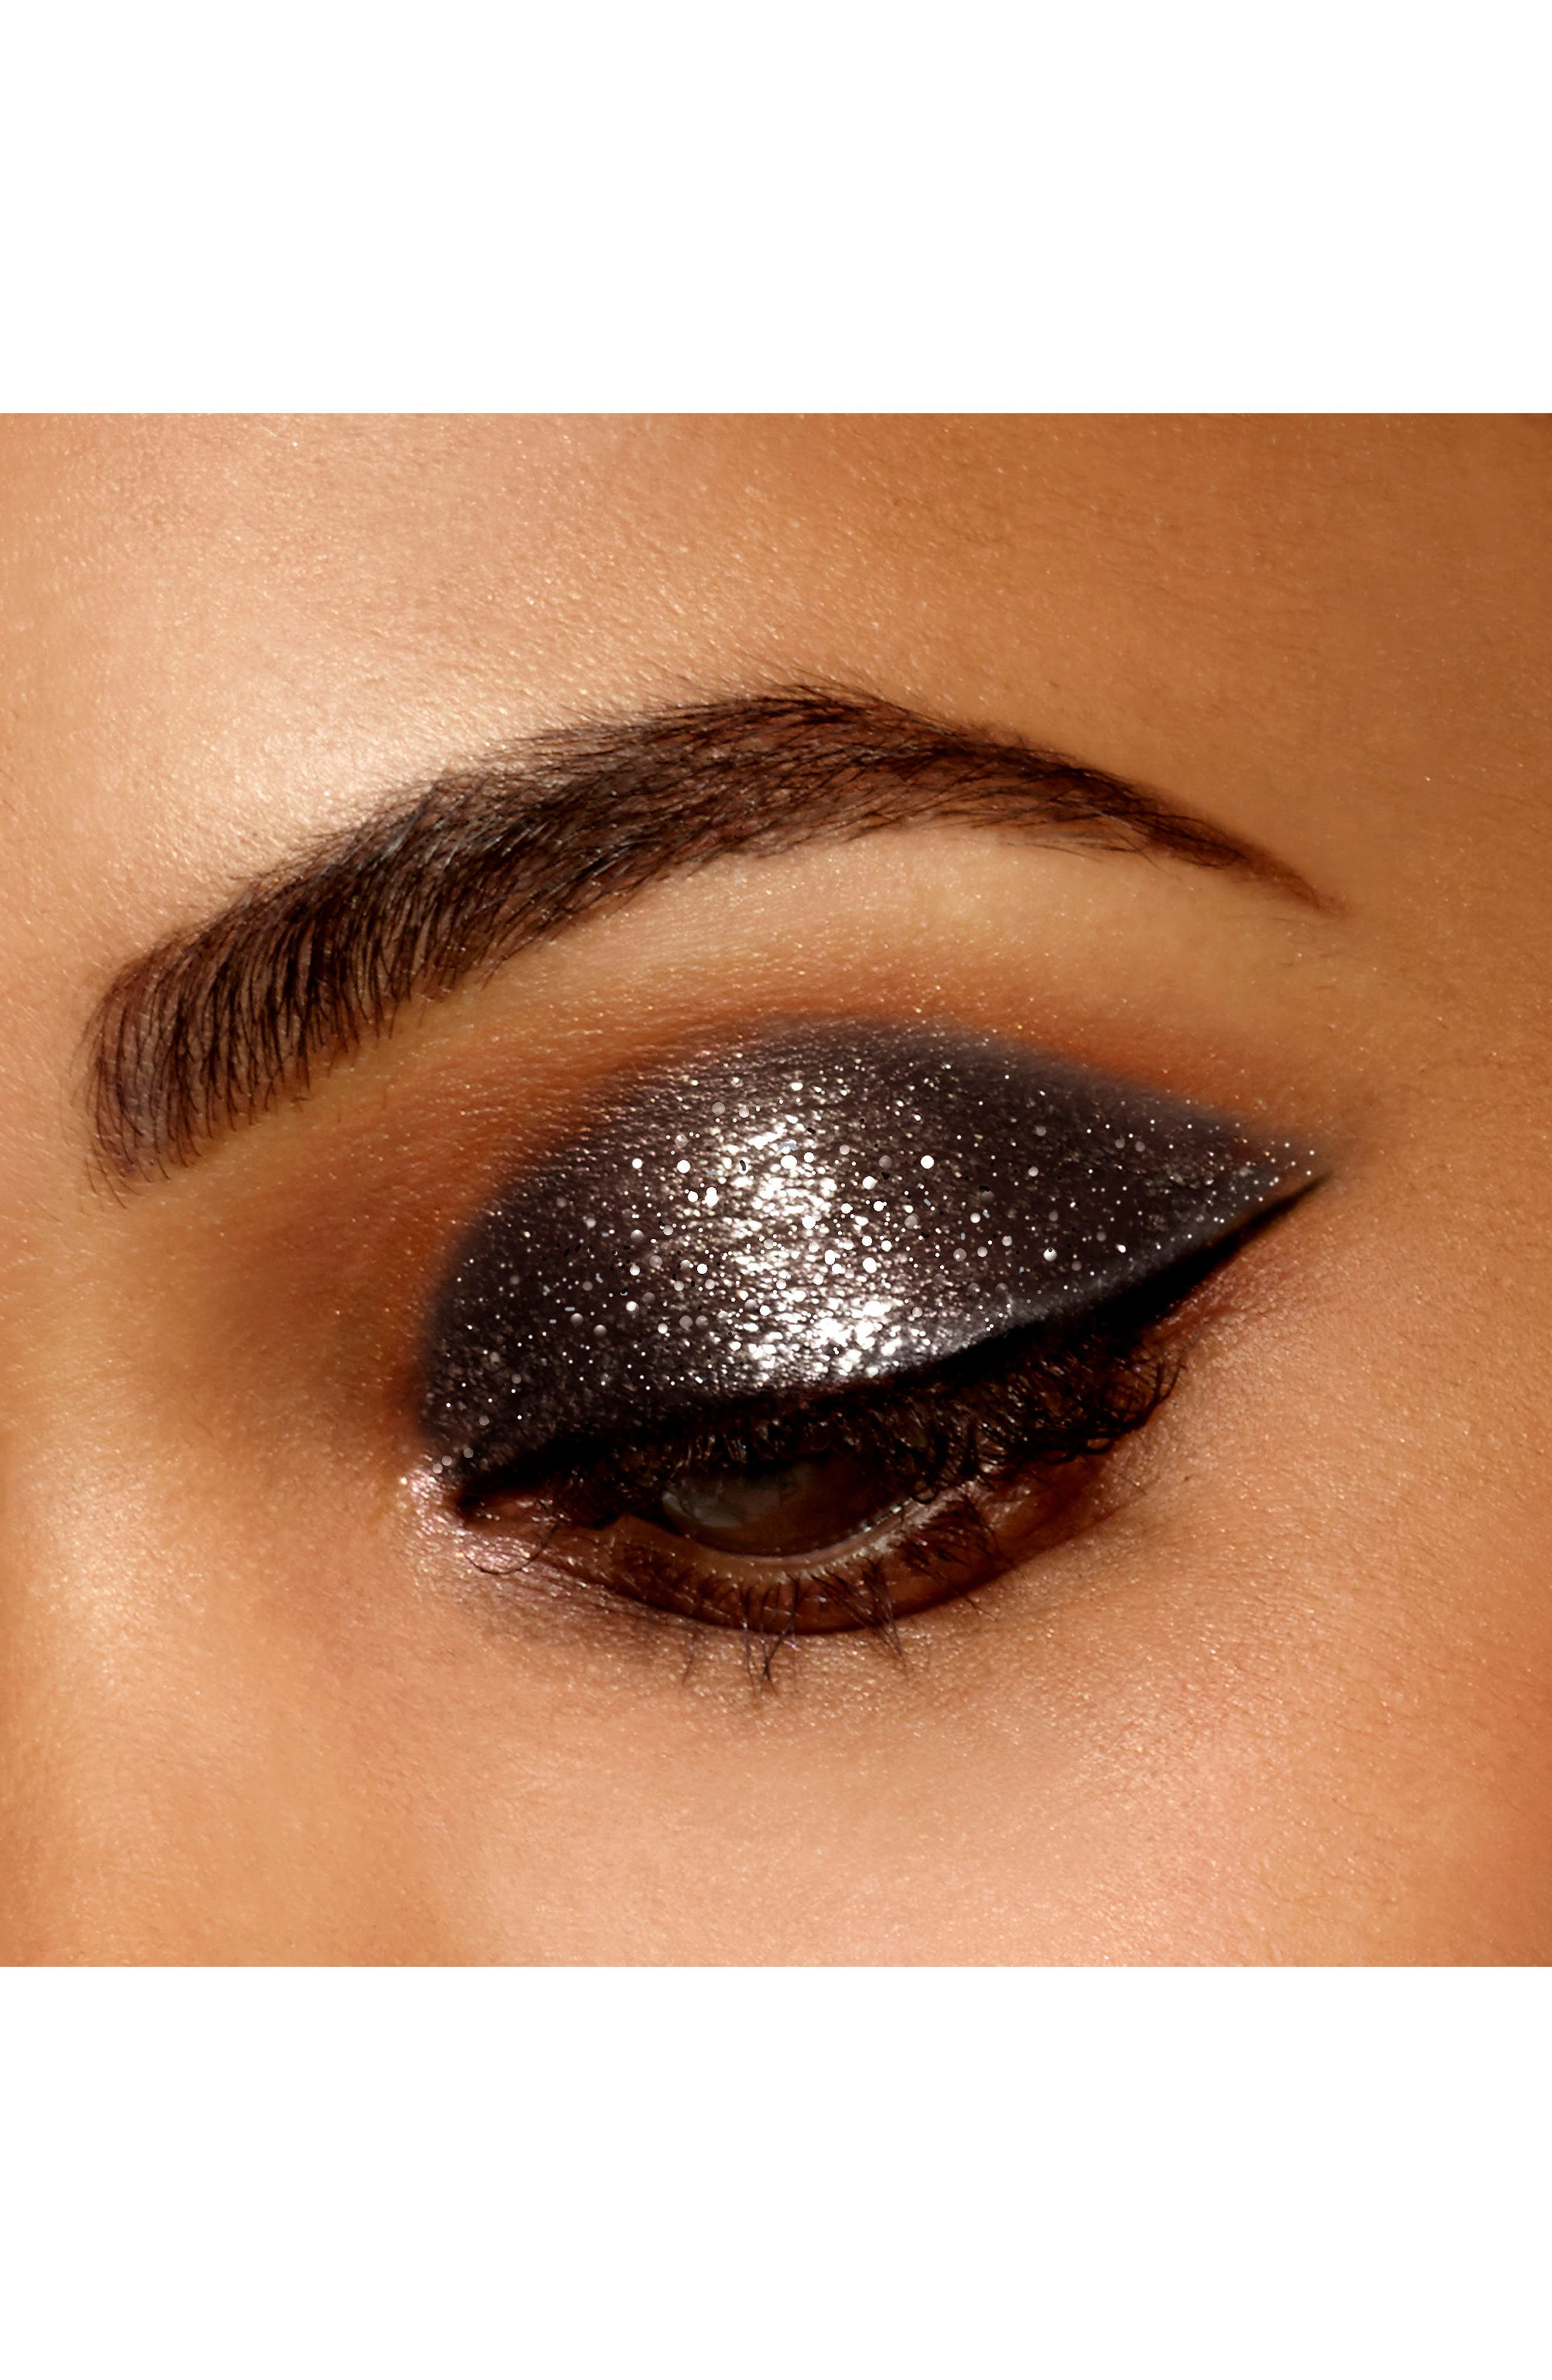 Magnificent Metals Glitter & Glow Liquid Eyeshadow,                             Alternate thumbnail 4, color,                             MOLTEN MIDNIGHT